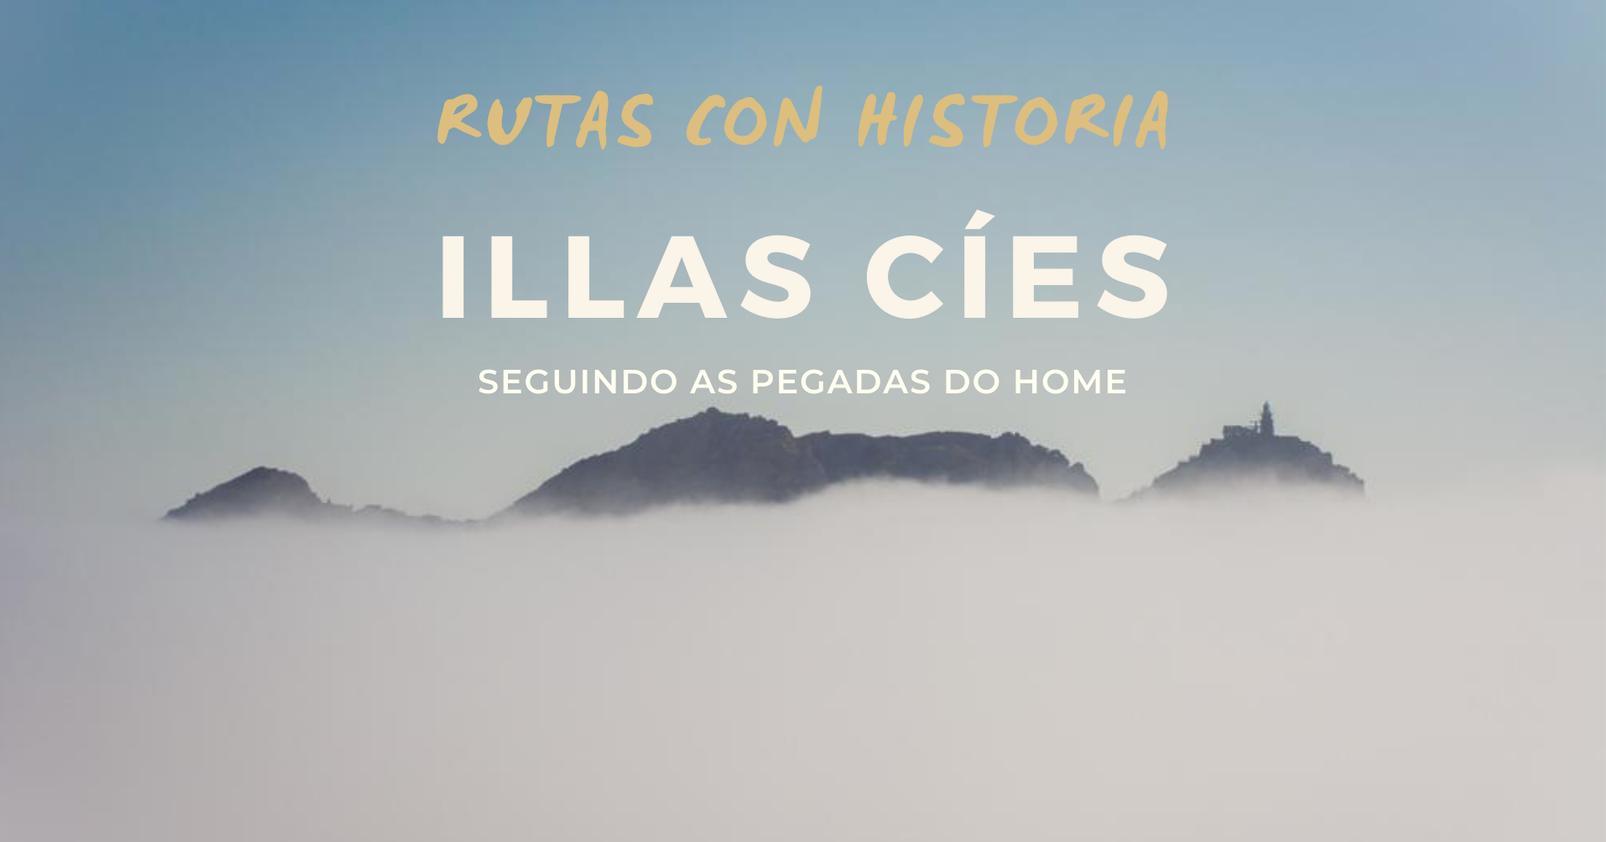 RUTA-ILLAS-CIES-VOLTA-MONTANA